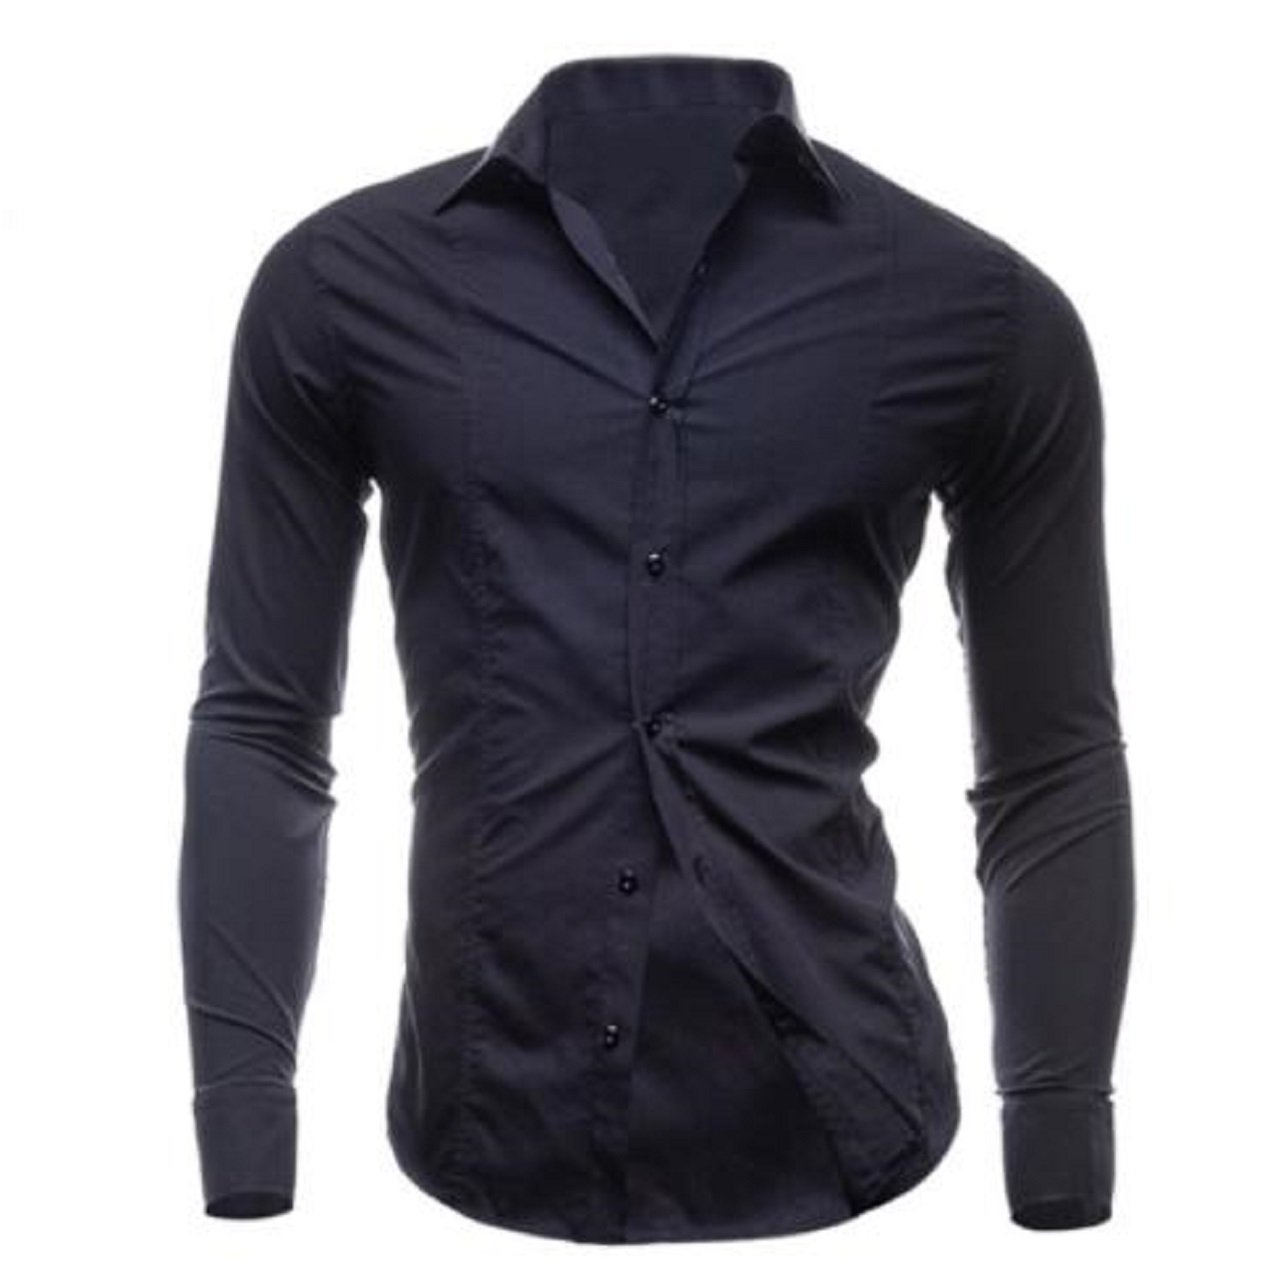 Hoffnung Solid Slim Casual Fashion Business Shirt Trend for Men M, Black.